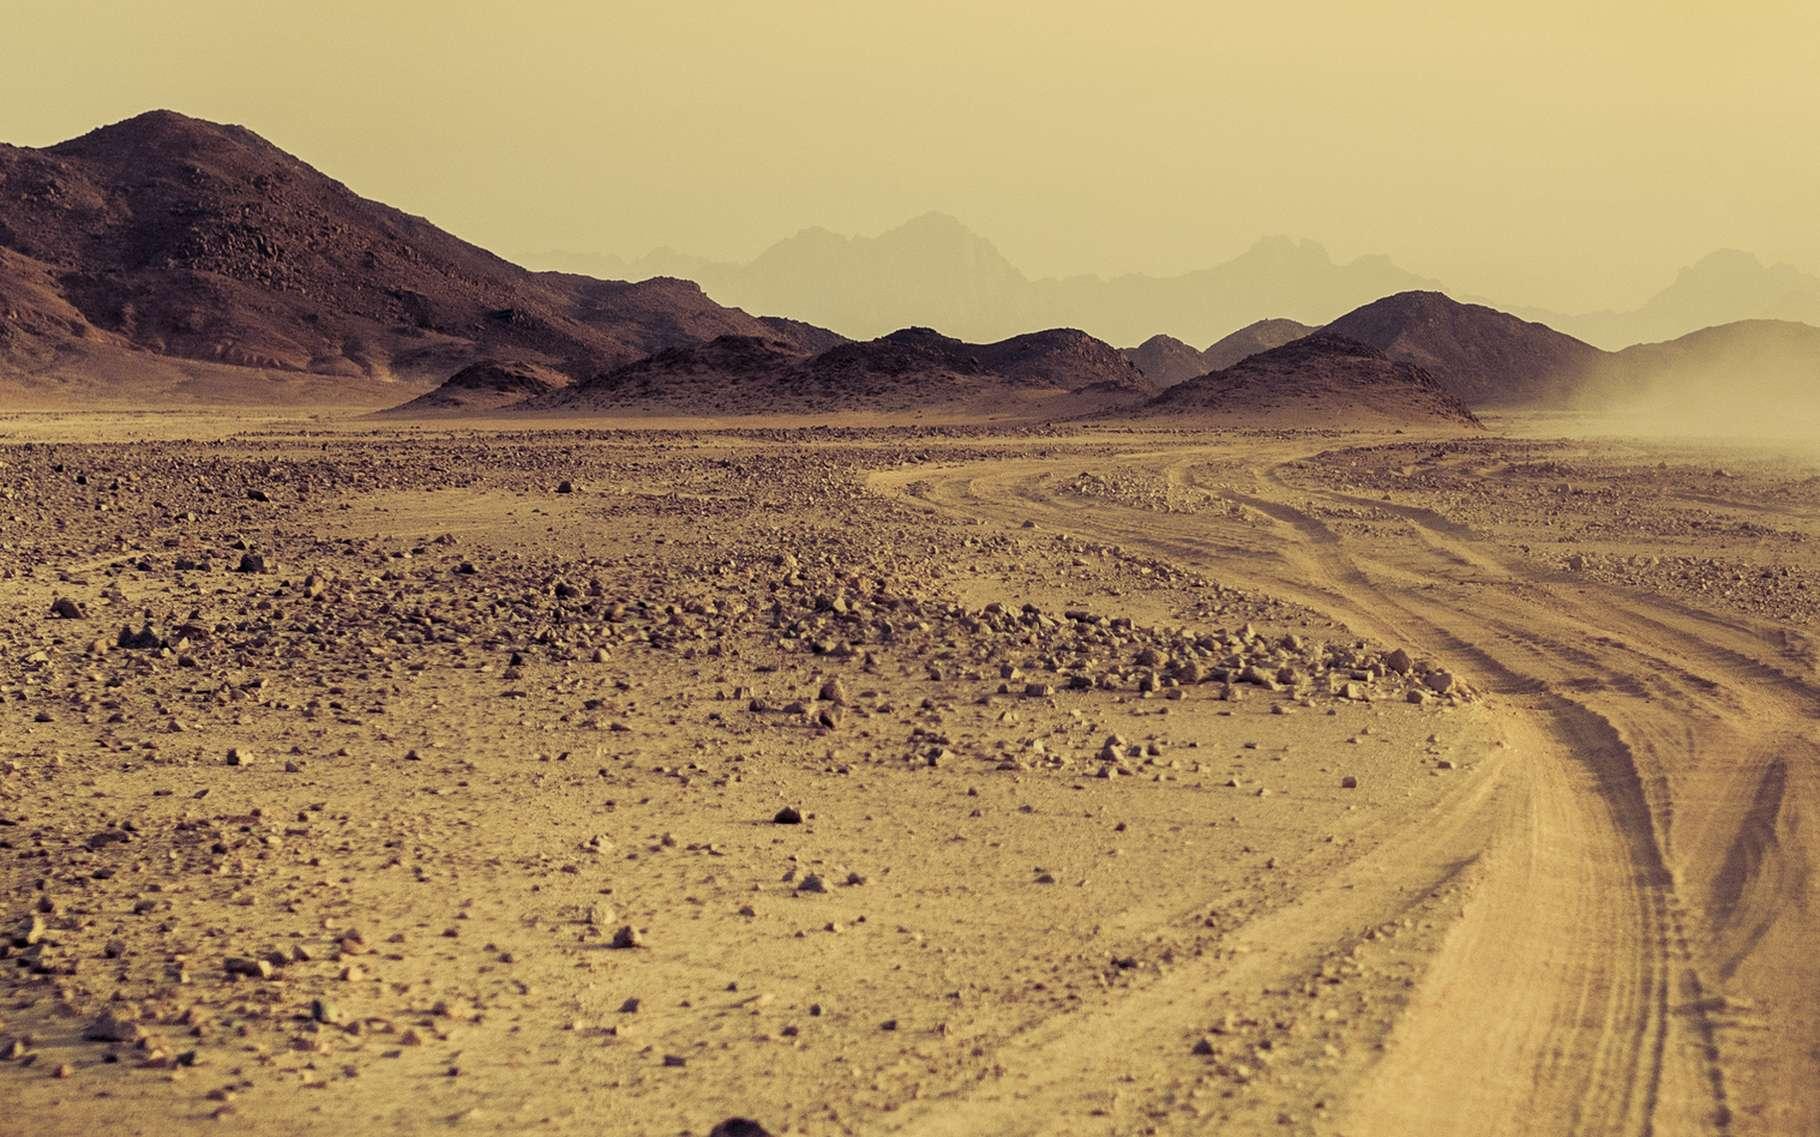 Qu'est-ce qu'un désert ? © Repina Valeriya, Shutterstock